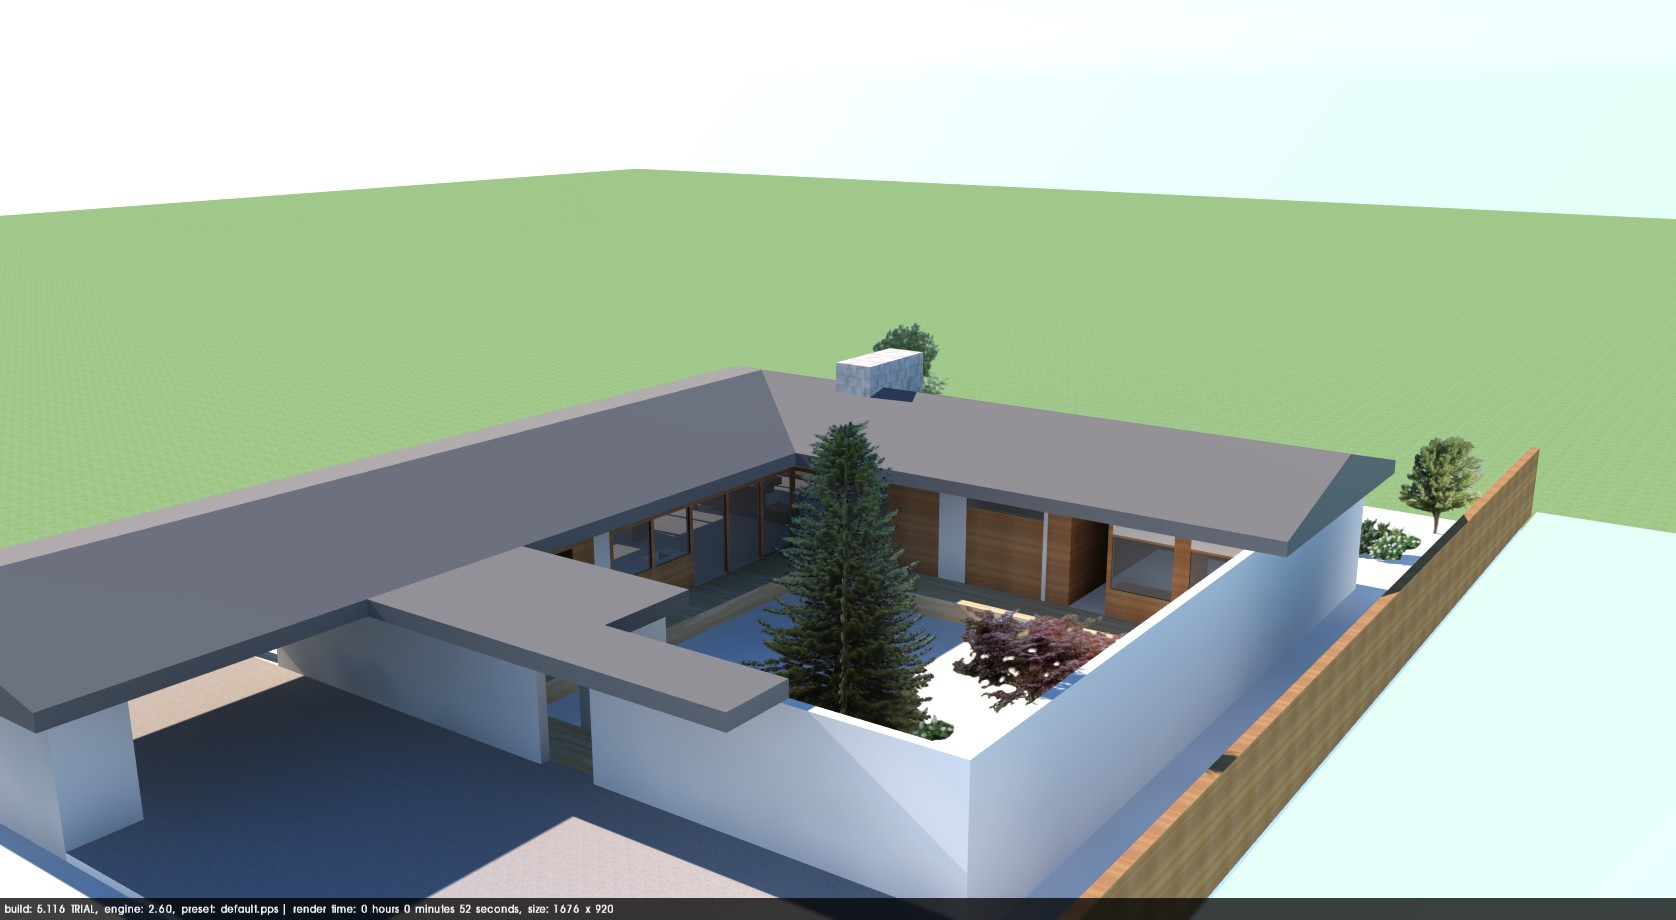 'Courtyard' Trystcraft orig. design